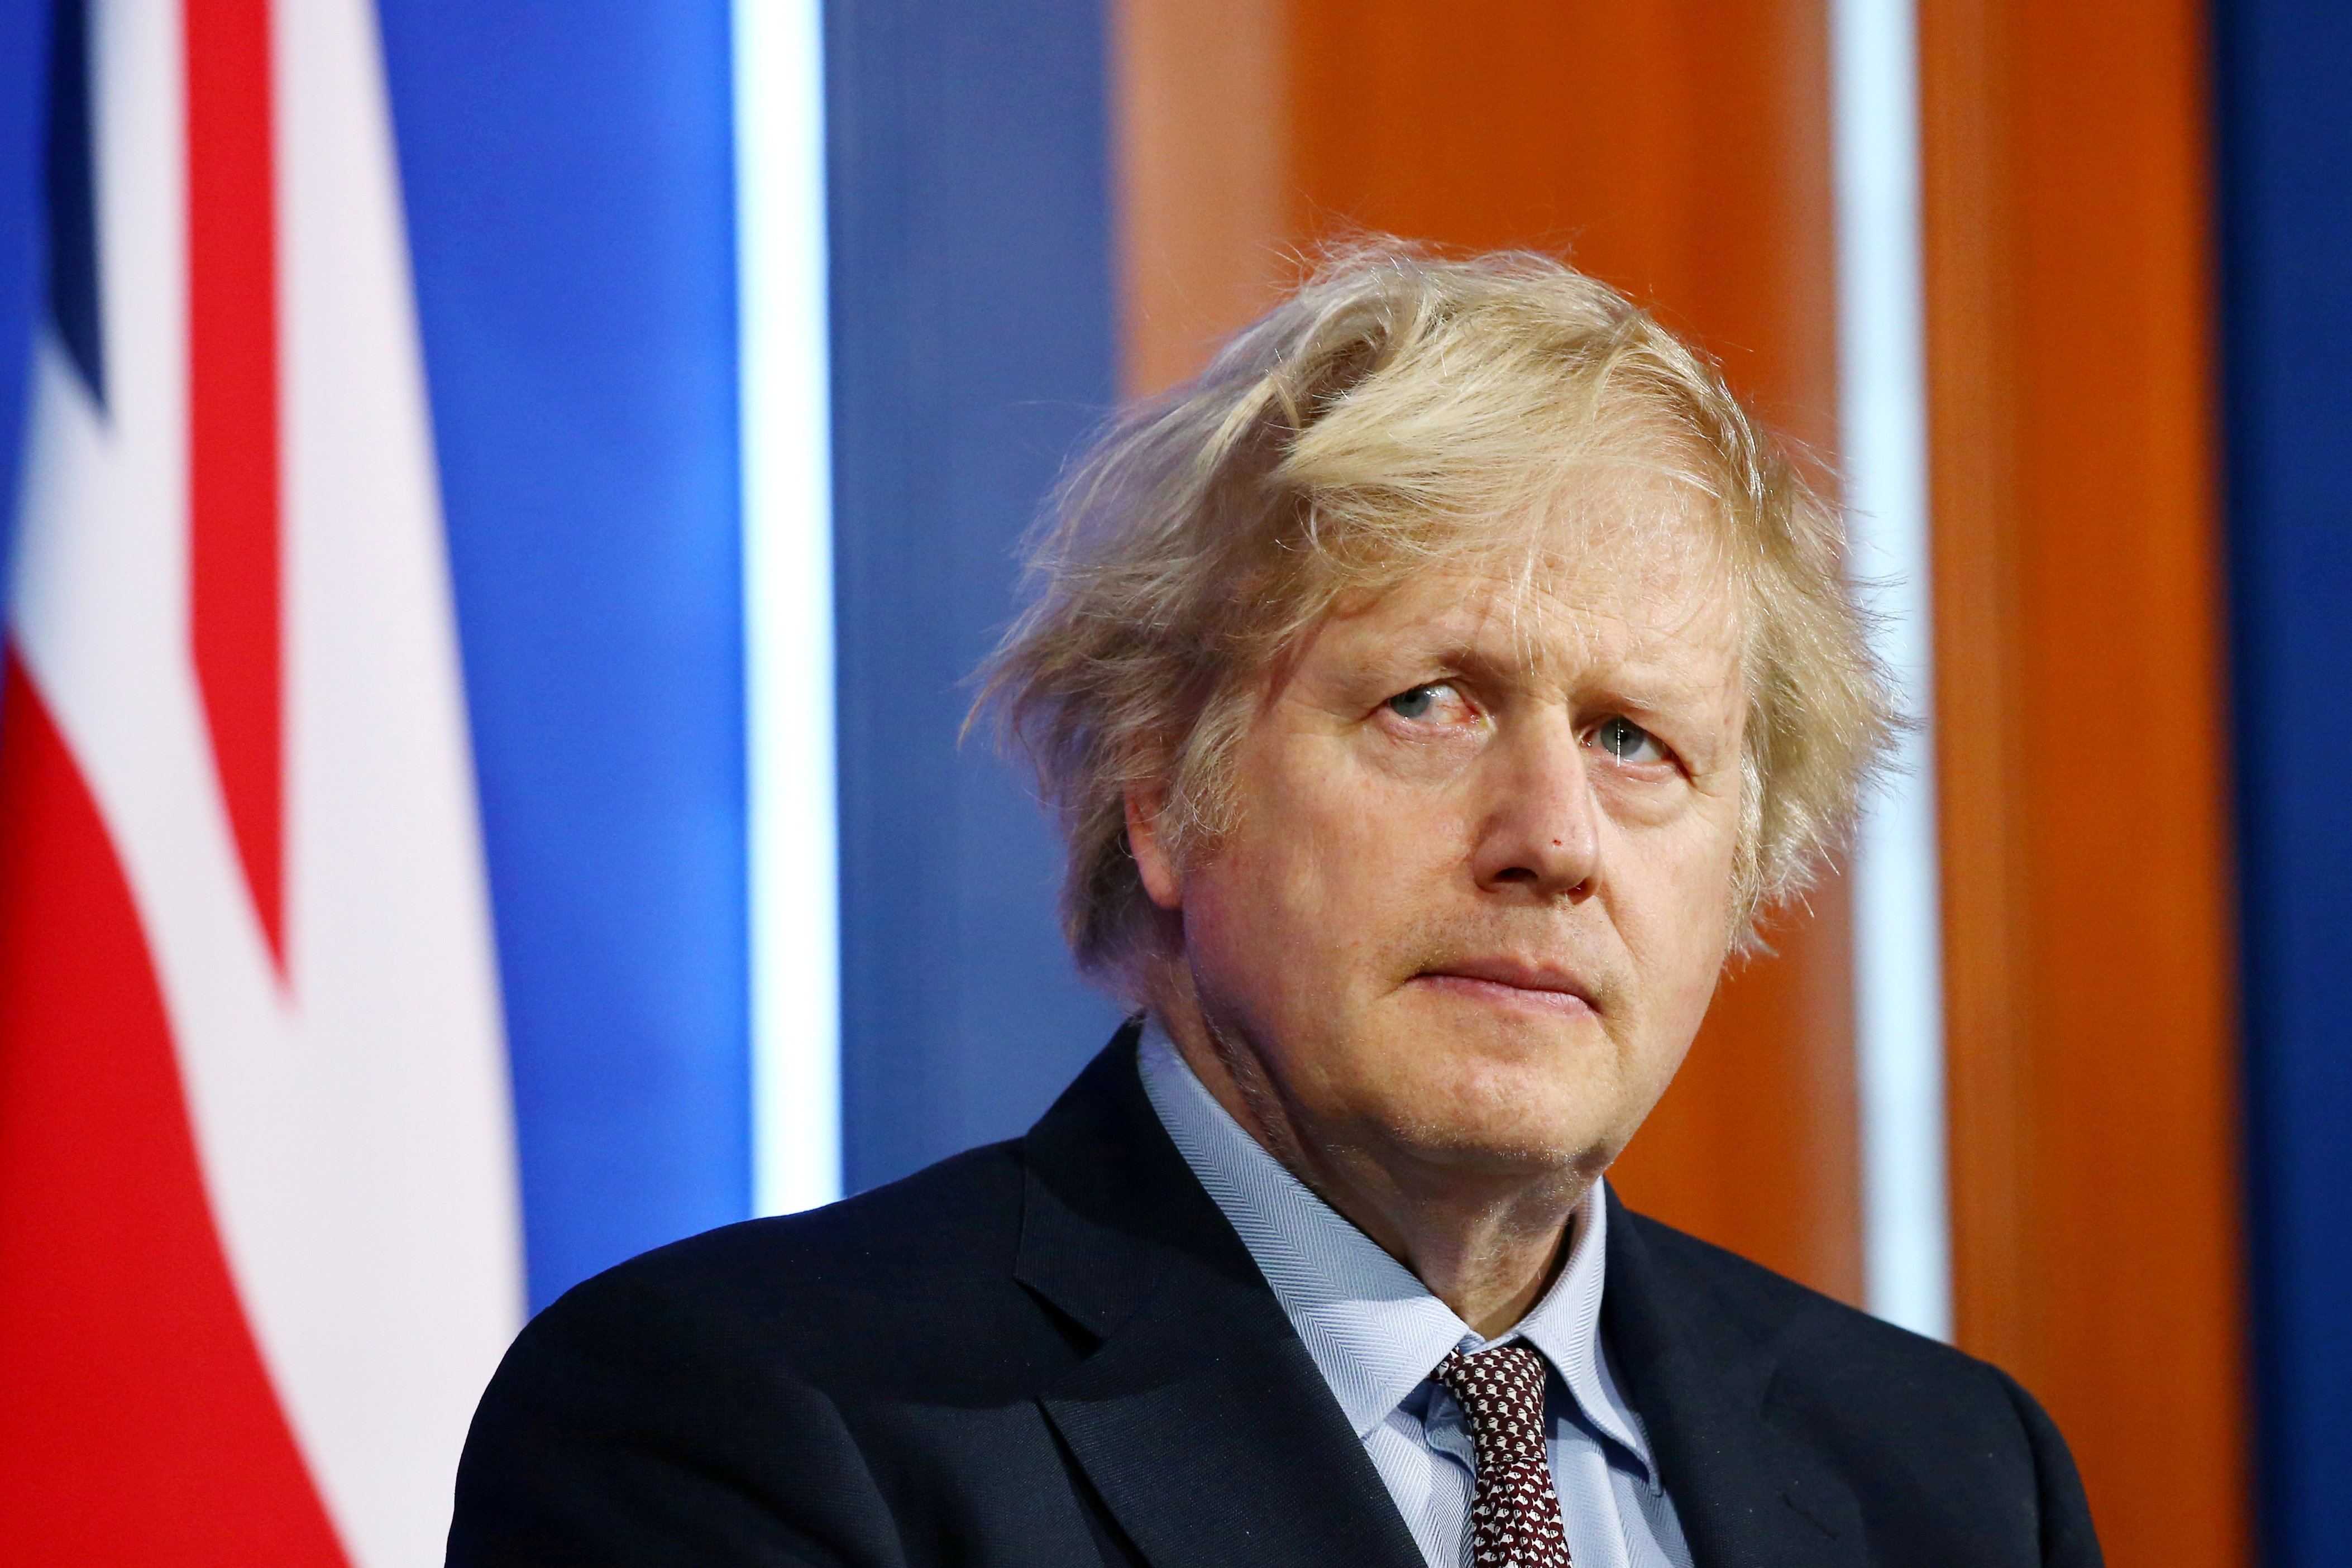 Boris Johnson launches mass testing program as U.K. economy reopens